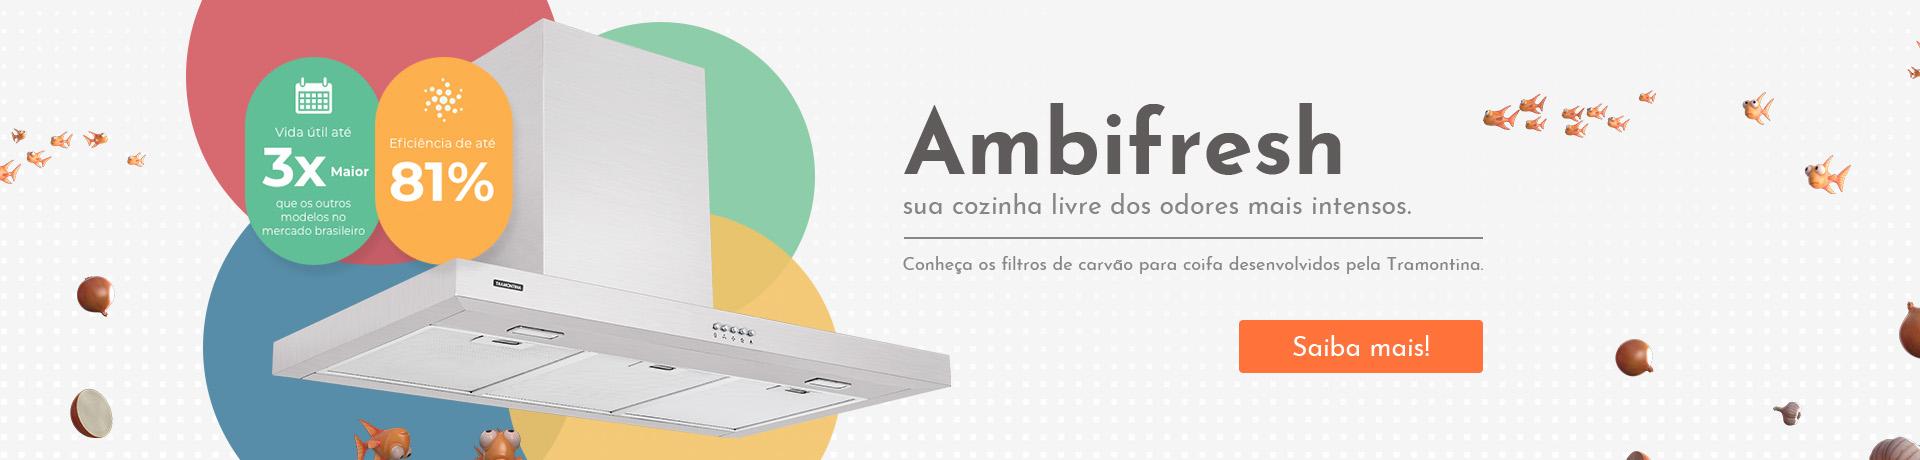 ambifresh